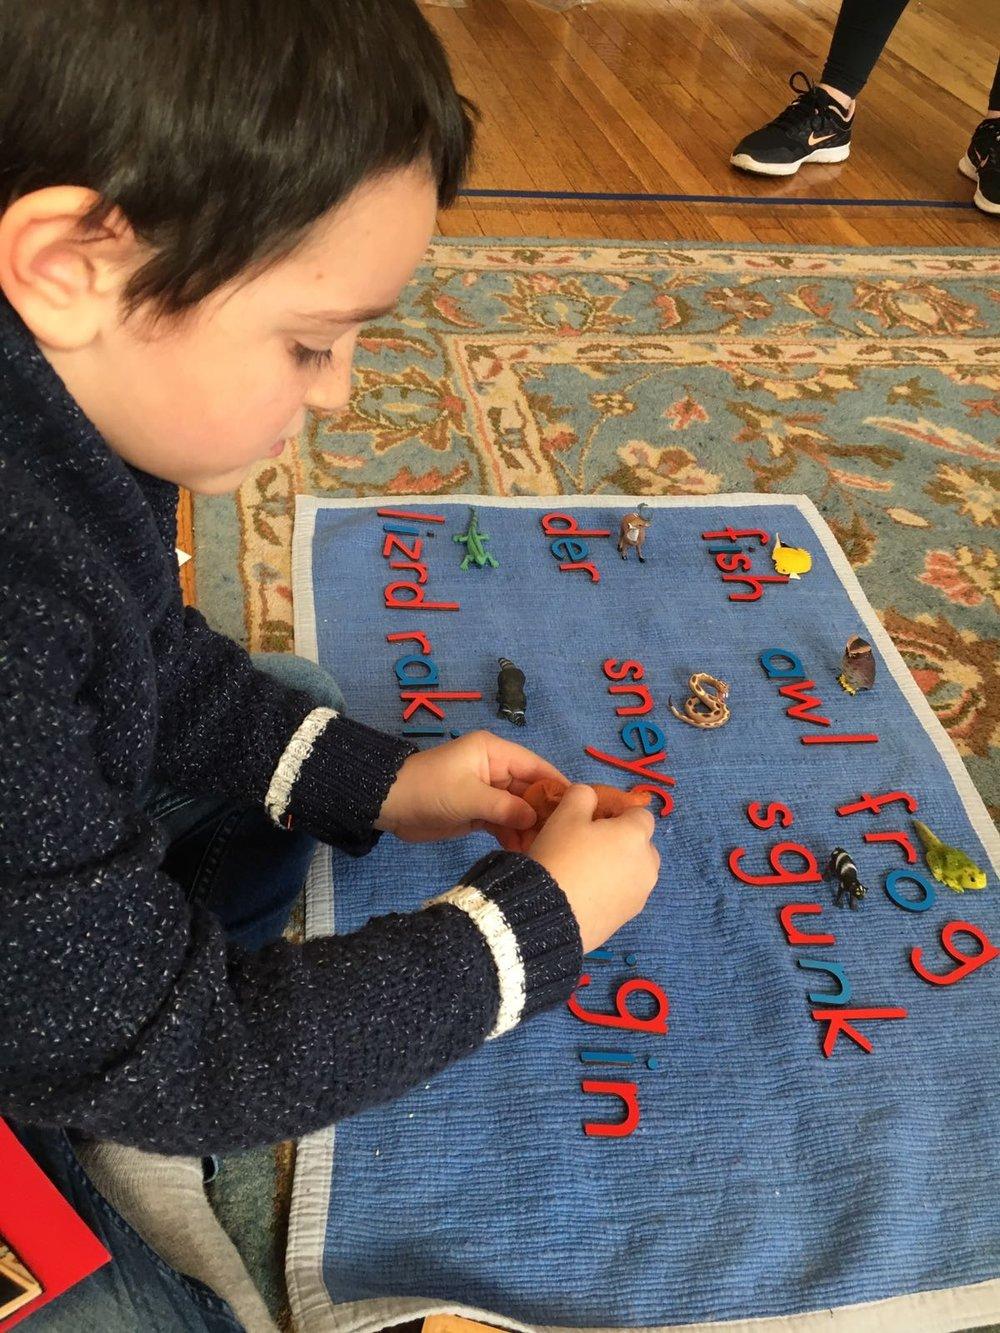 Sholom makes progress in his language skills